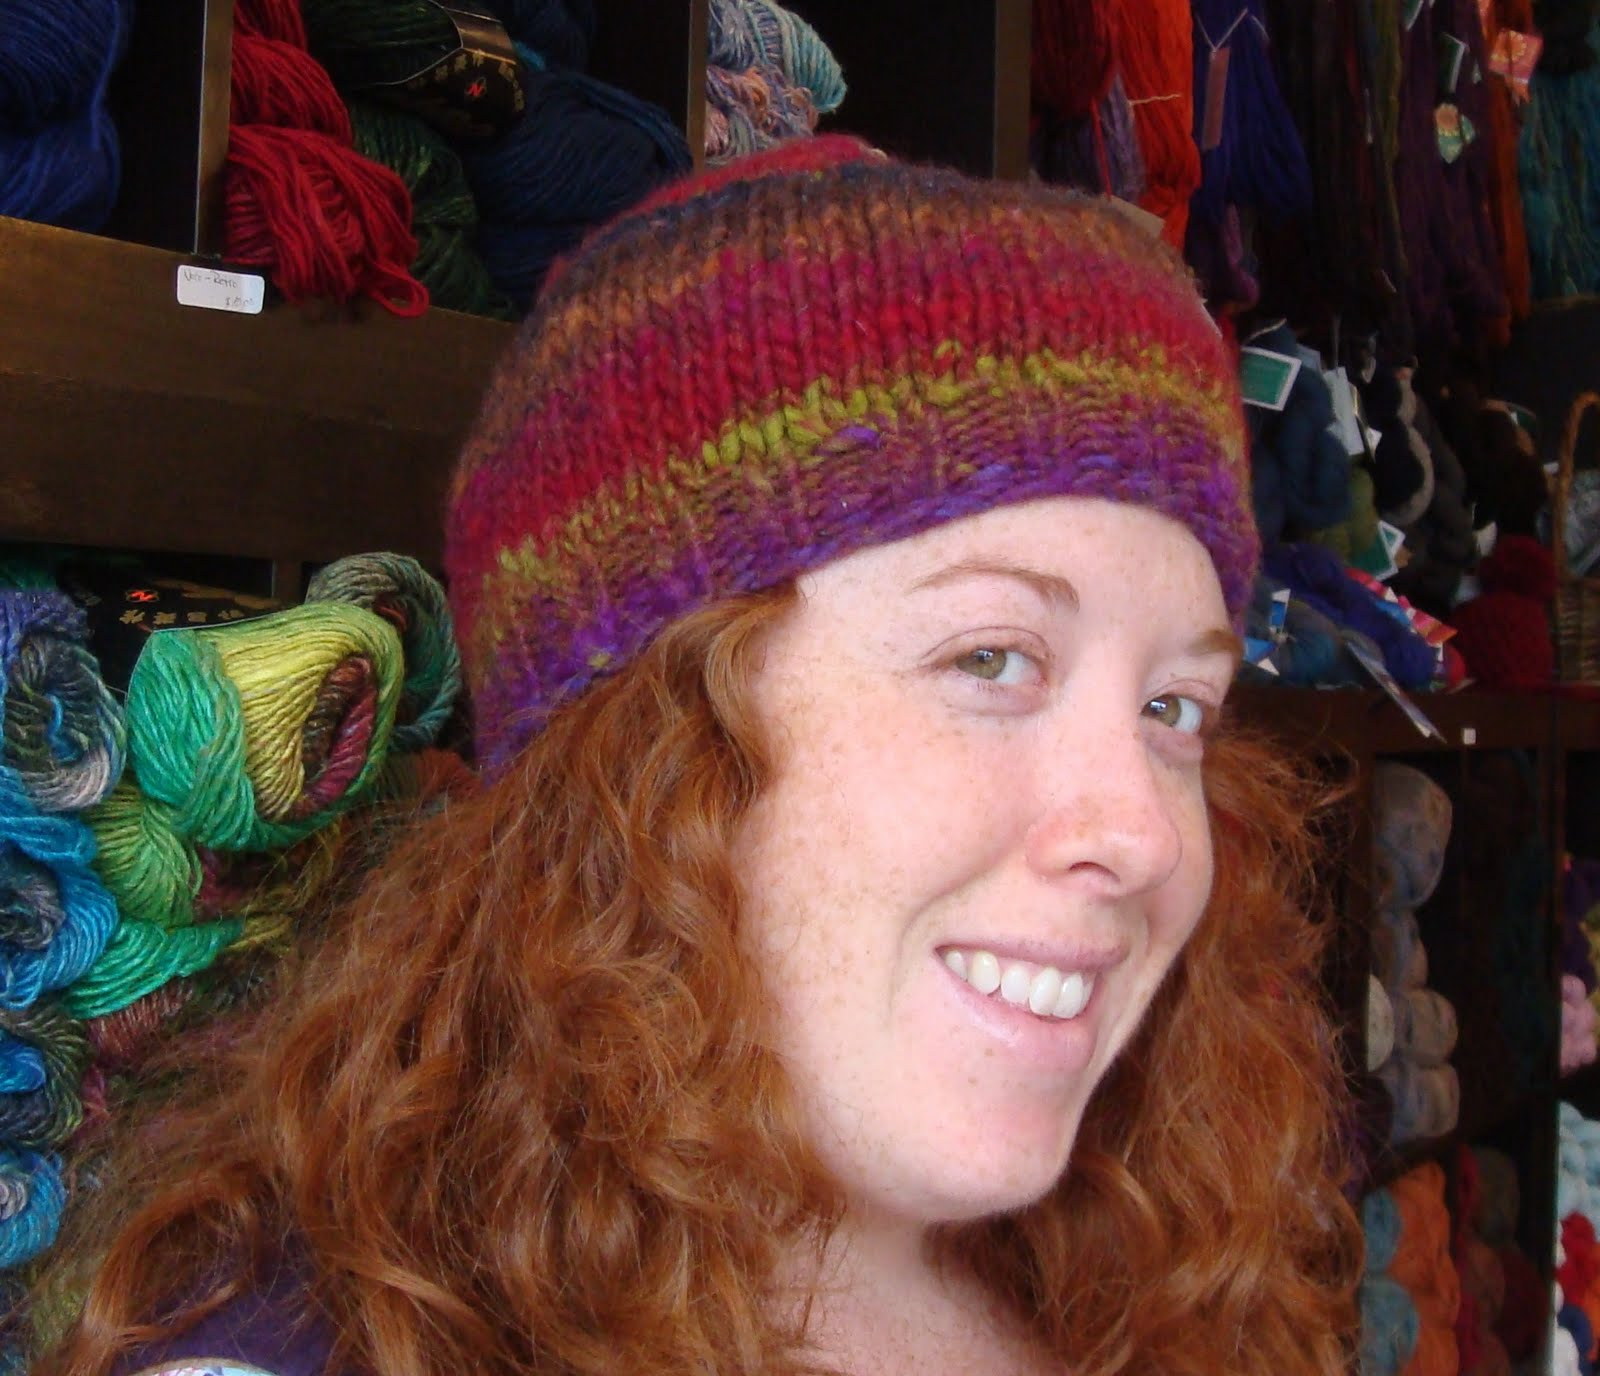 Knitting Terms Kfb : Kate atherley knits a lot mainly socks free pattern